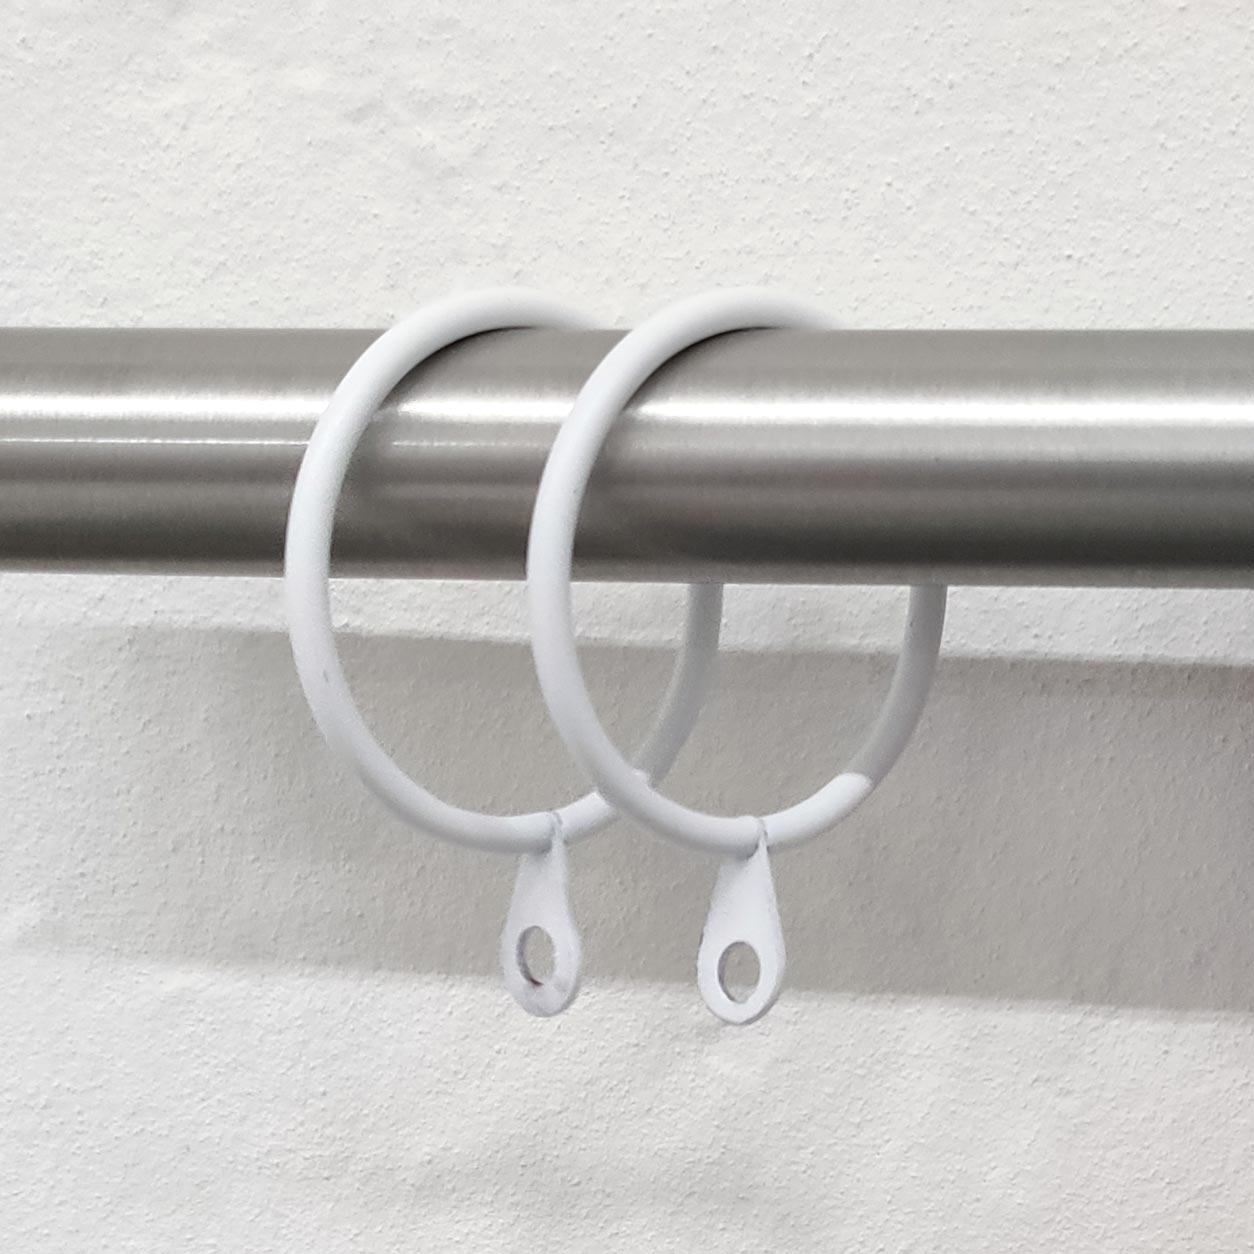 Anelli per Bastoni Diametro 36 mm - Bianco Opaco - 10 pz